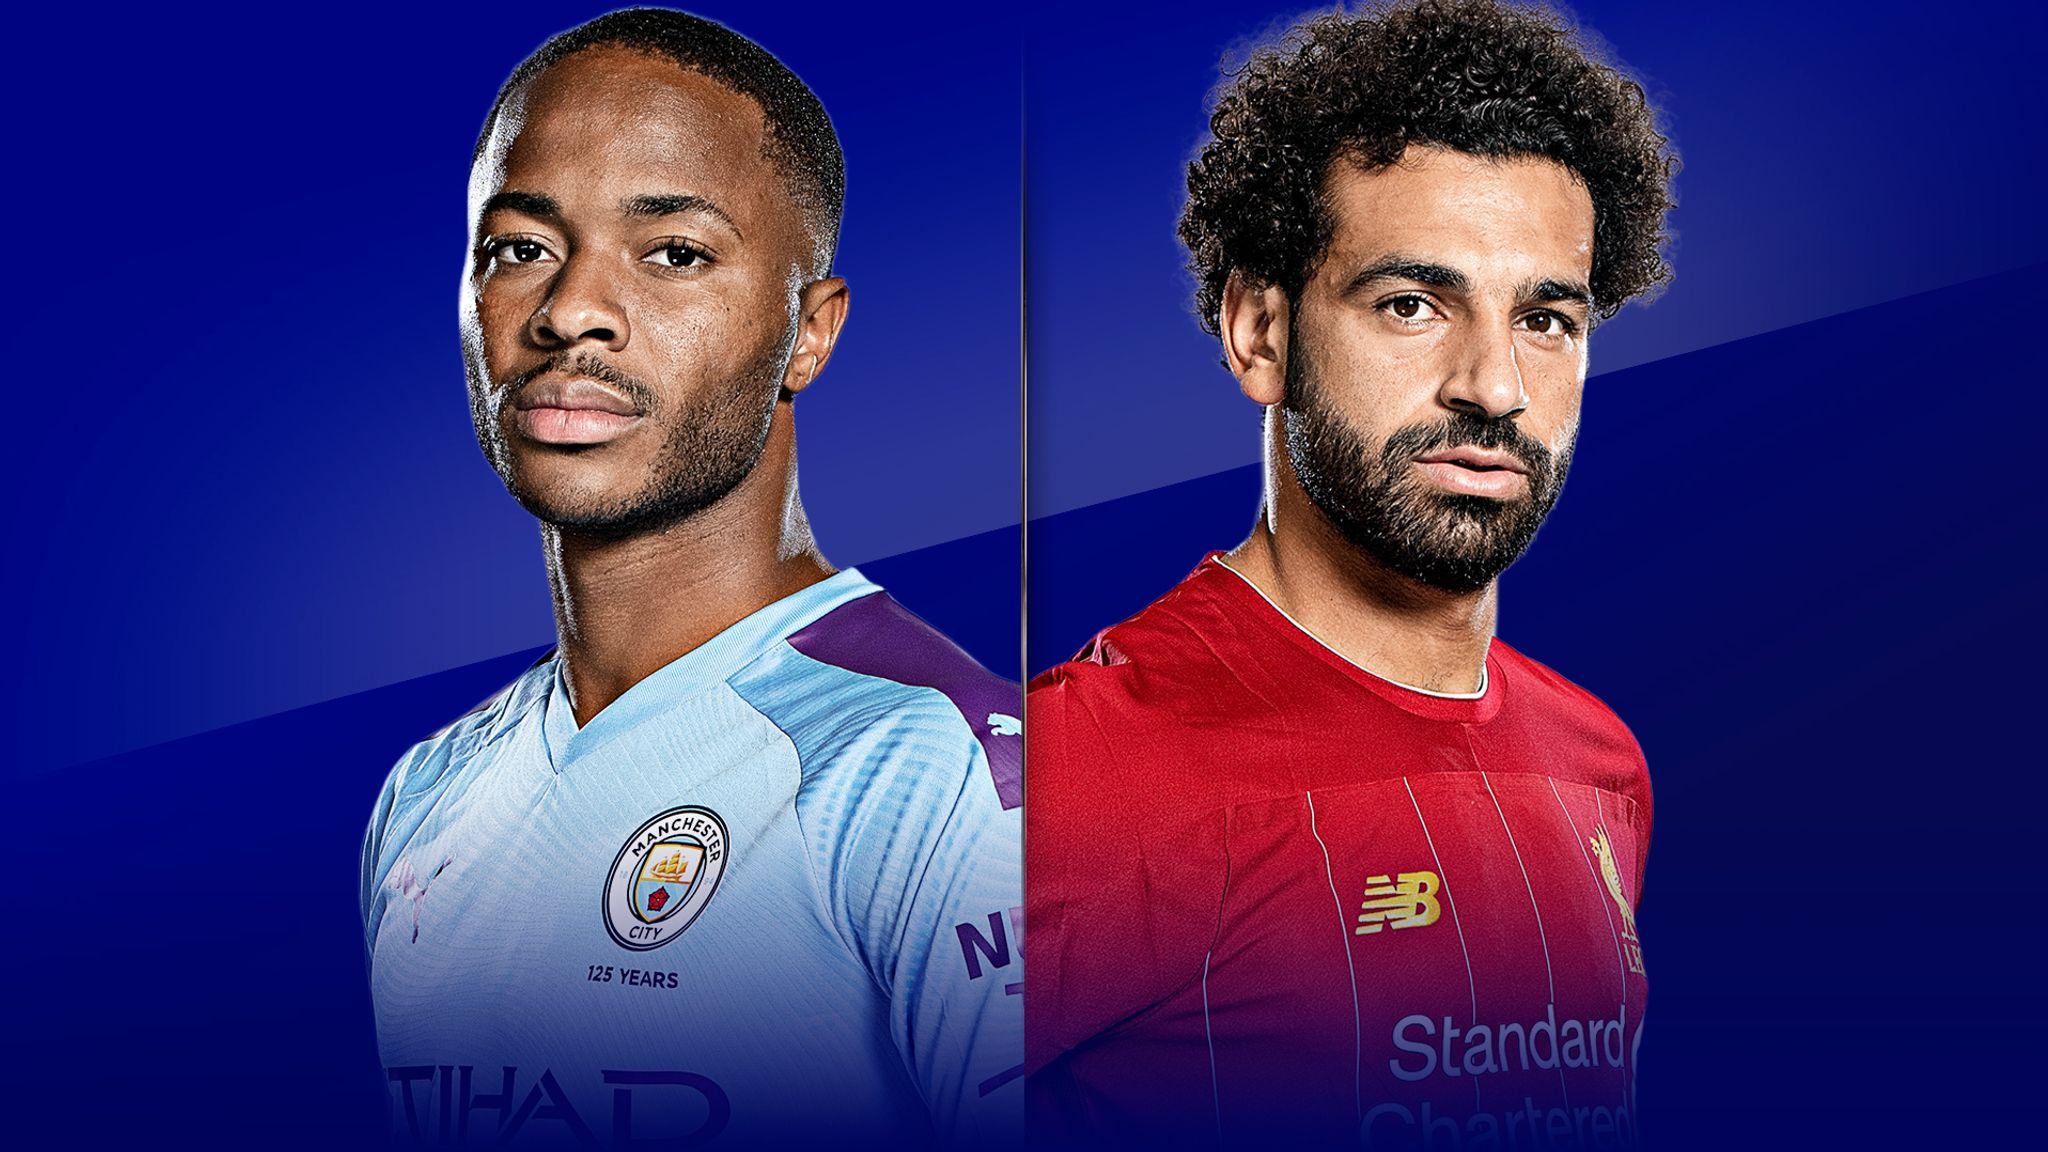 Live match preview - Man City vs Liverpool 02.07.2020